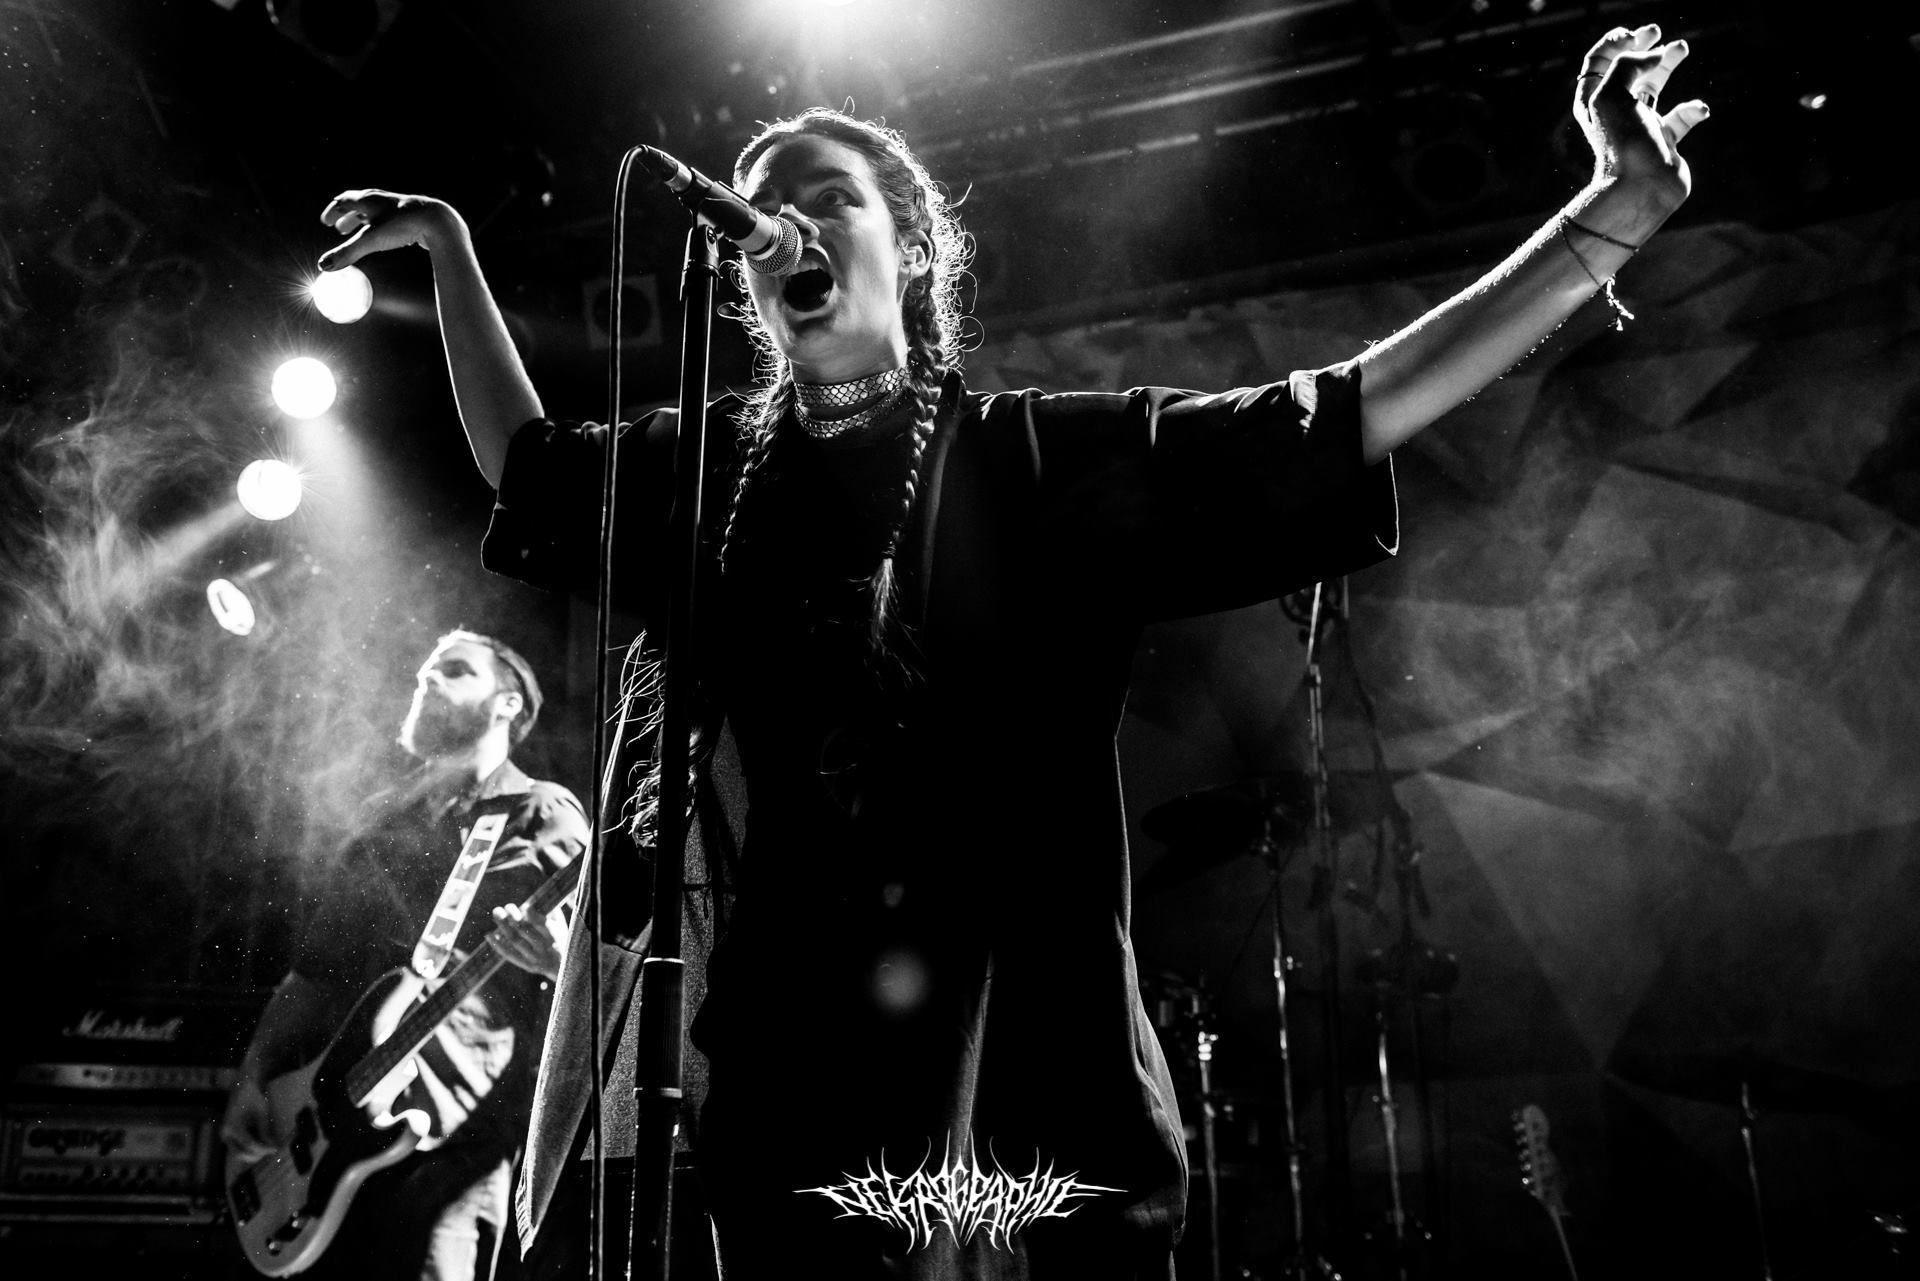 Milena Eva of GOLD - Post everything dark rock - Dutch band